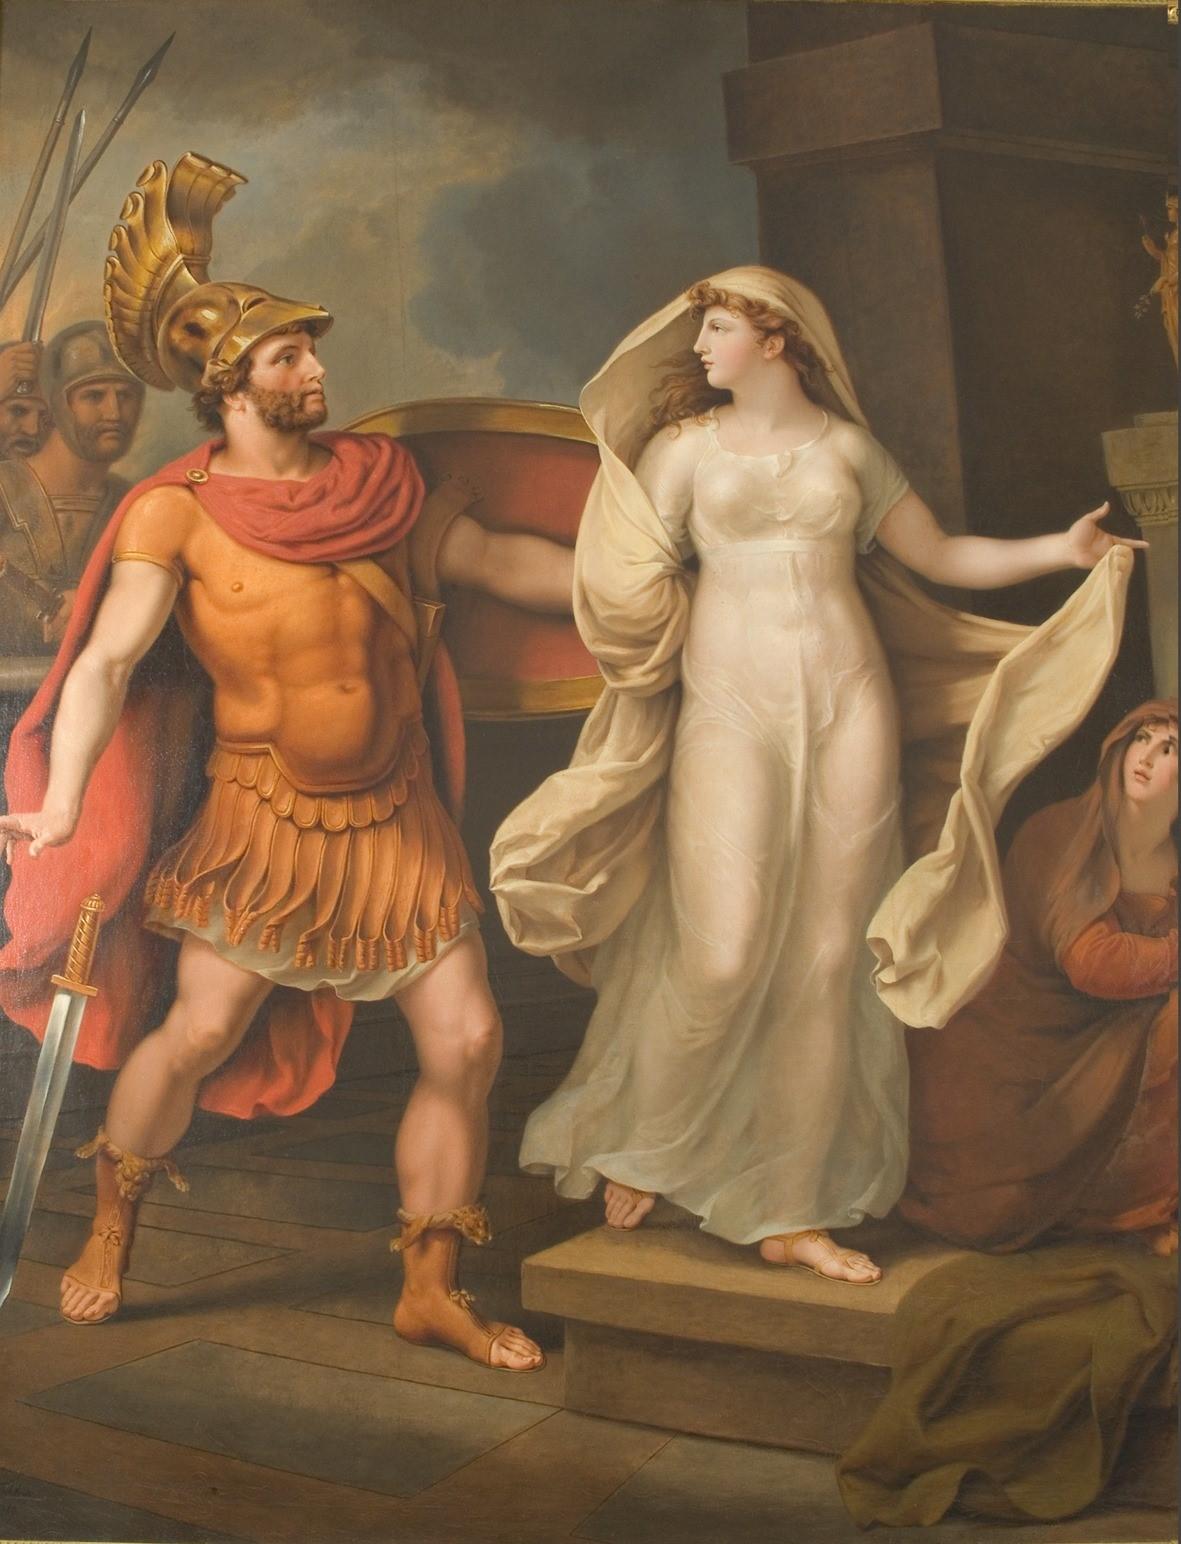 dødsriget i romersk mytologi